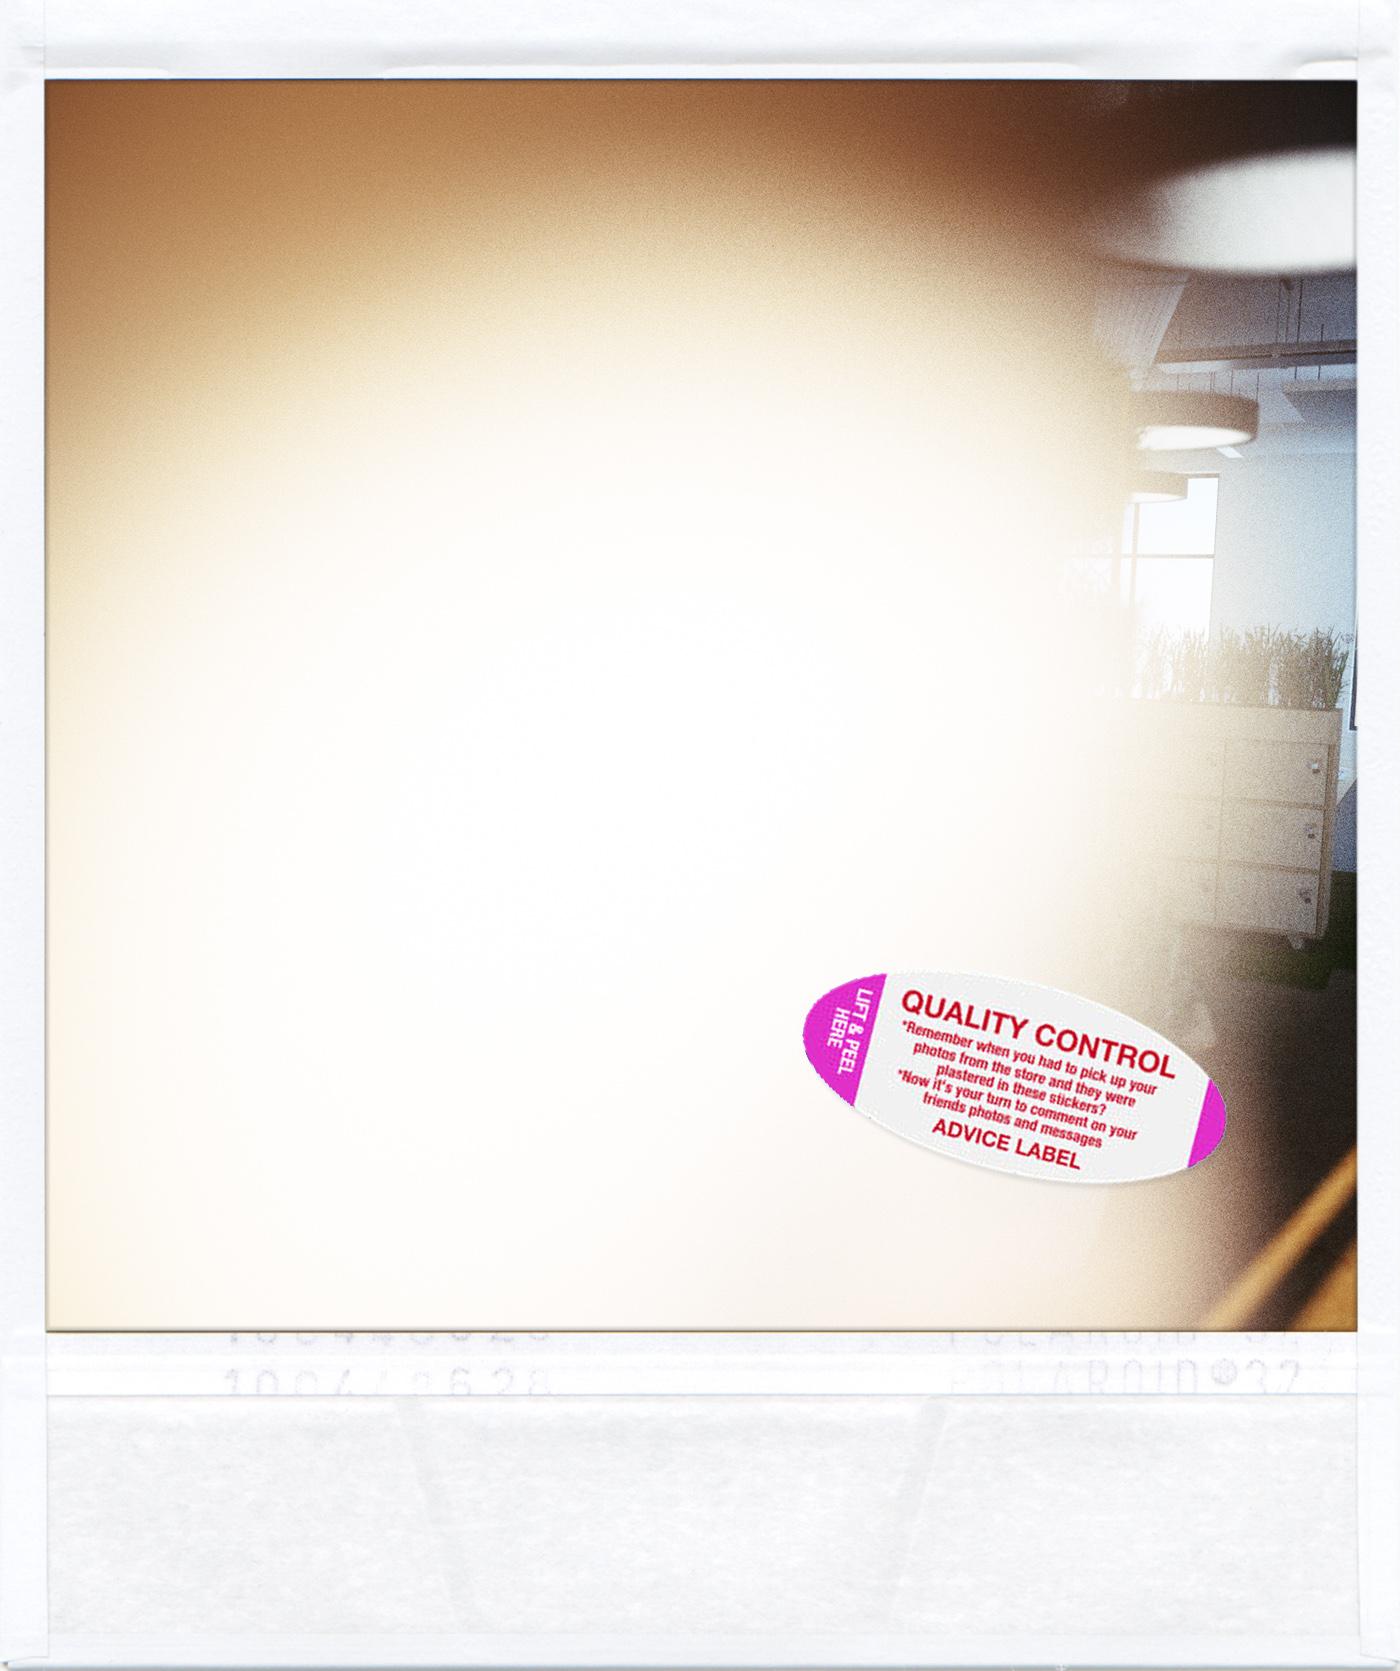 173-ASK_SoilAssociation_Polaroid4.jpg